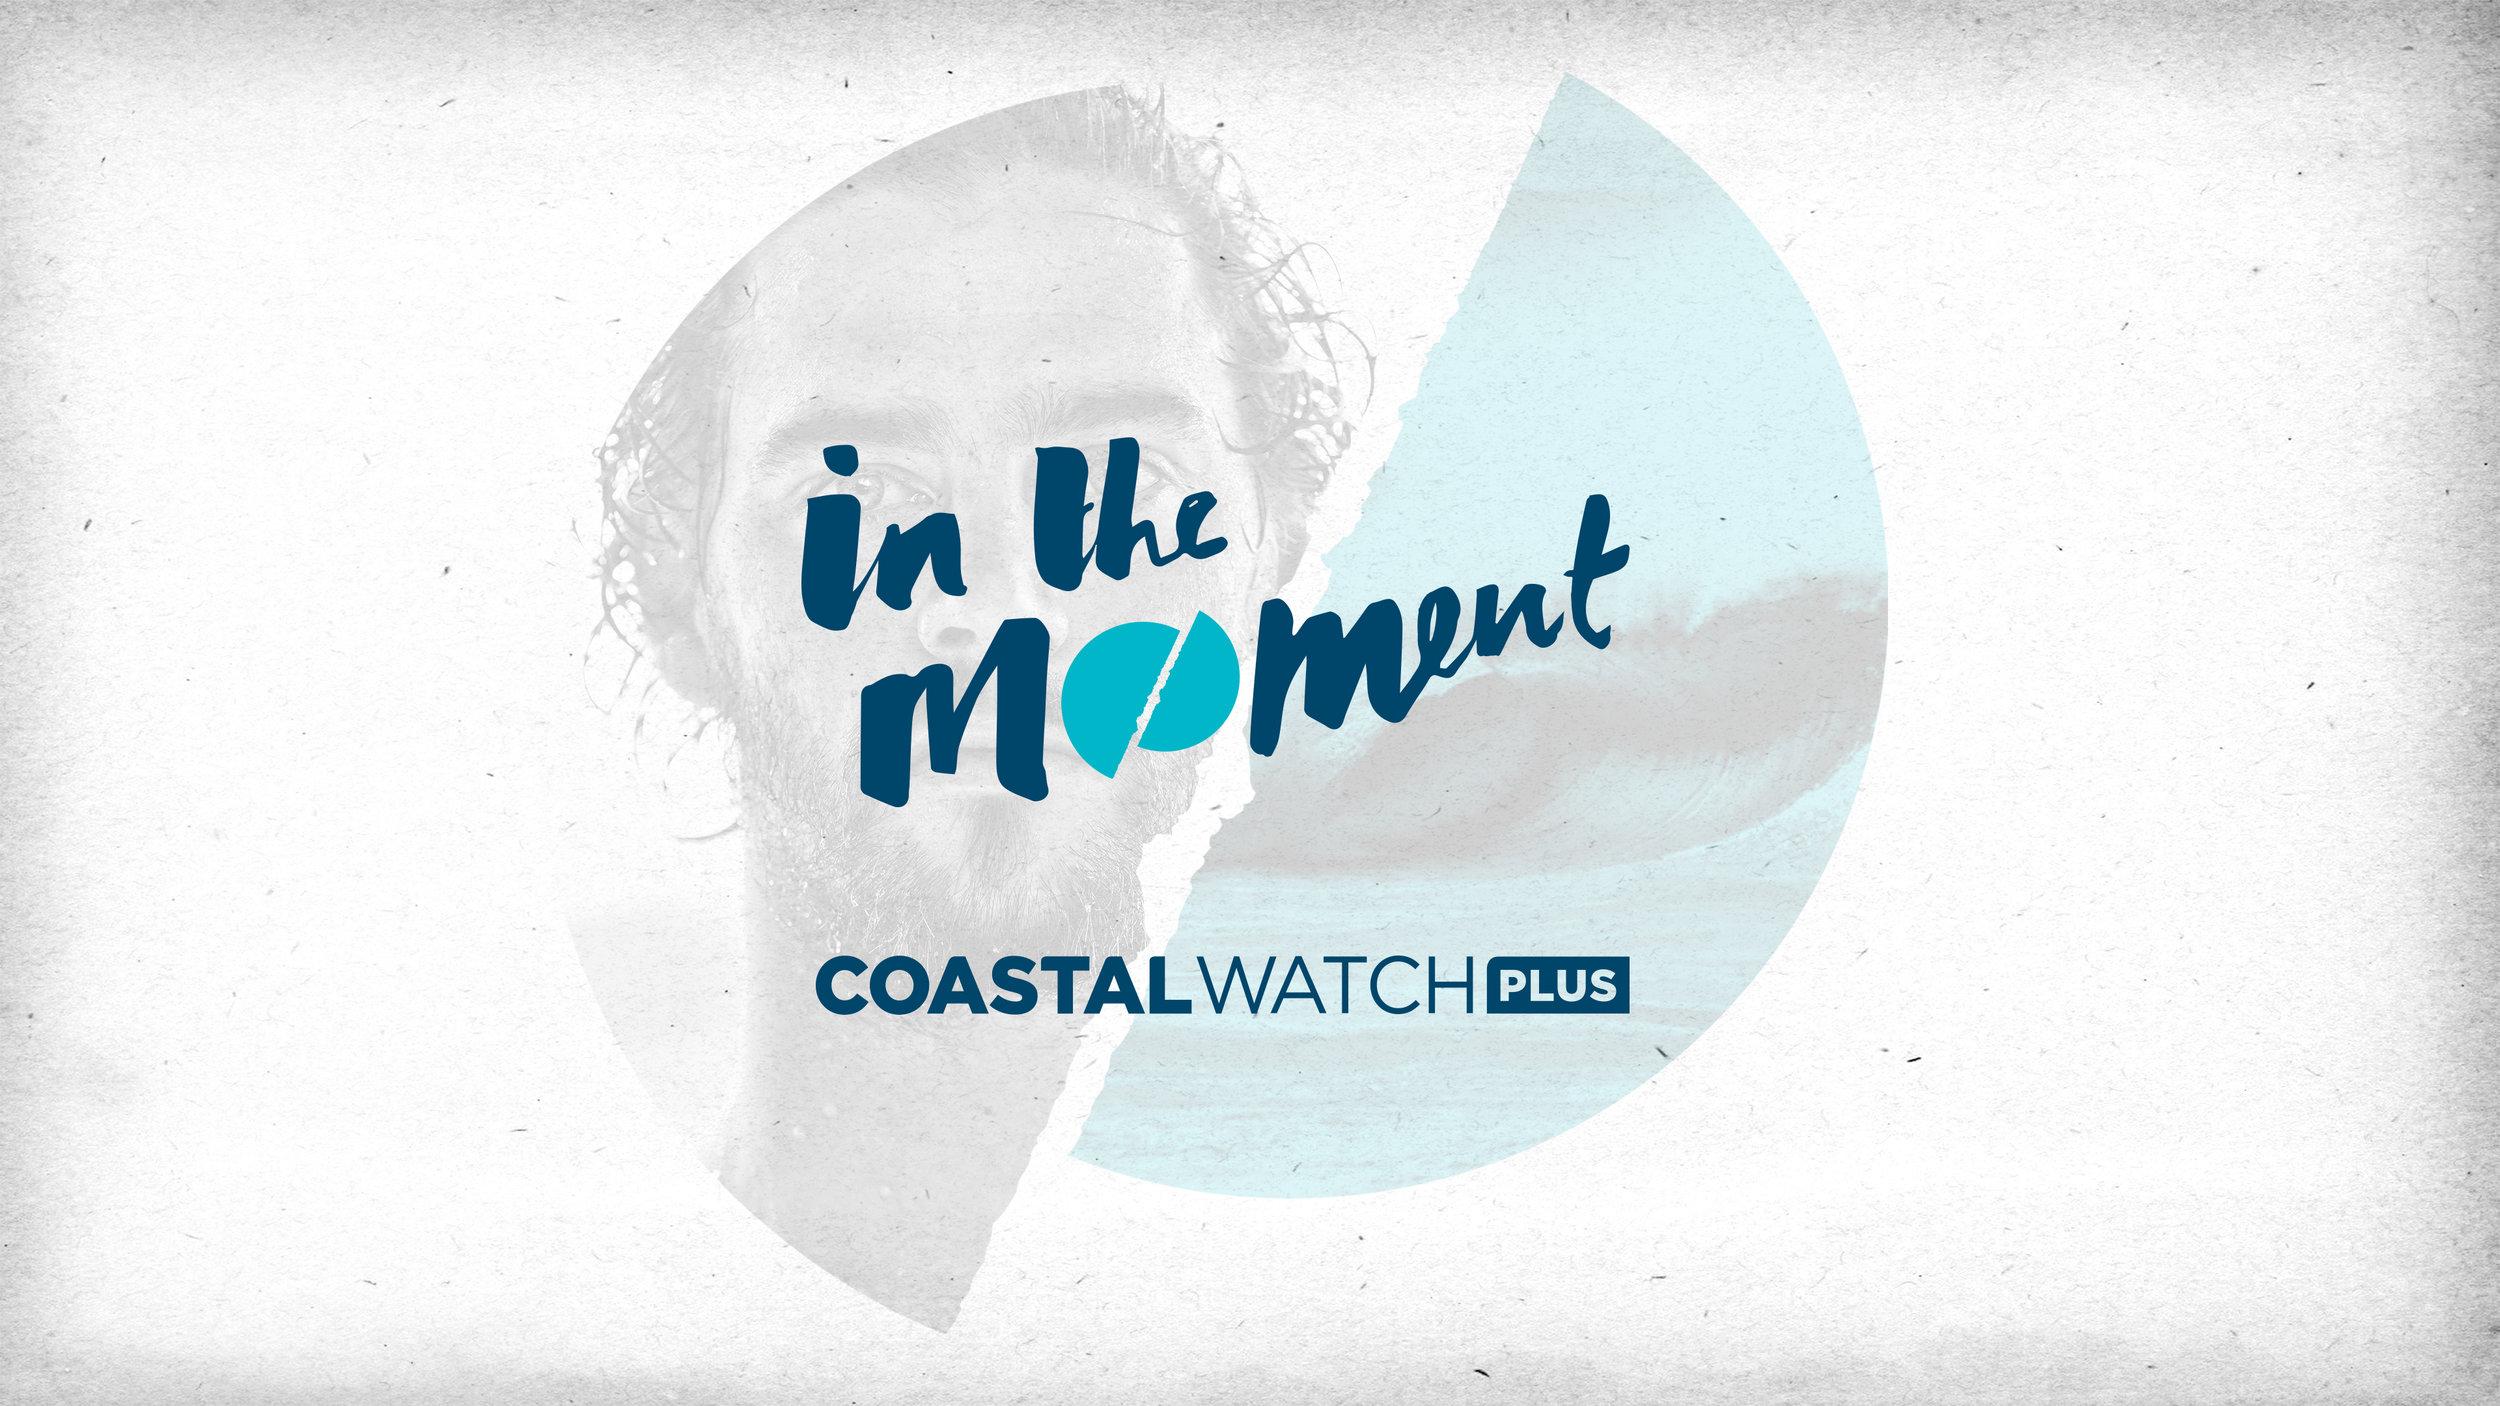 coastalwatch_8.jpg